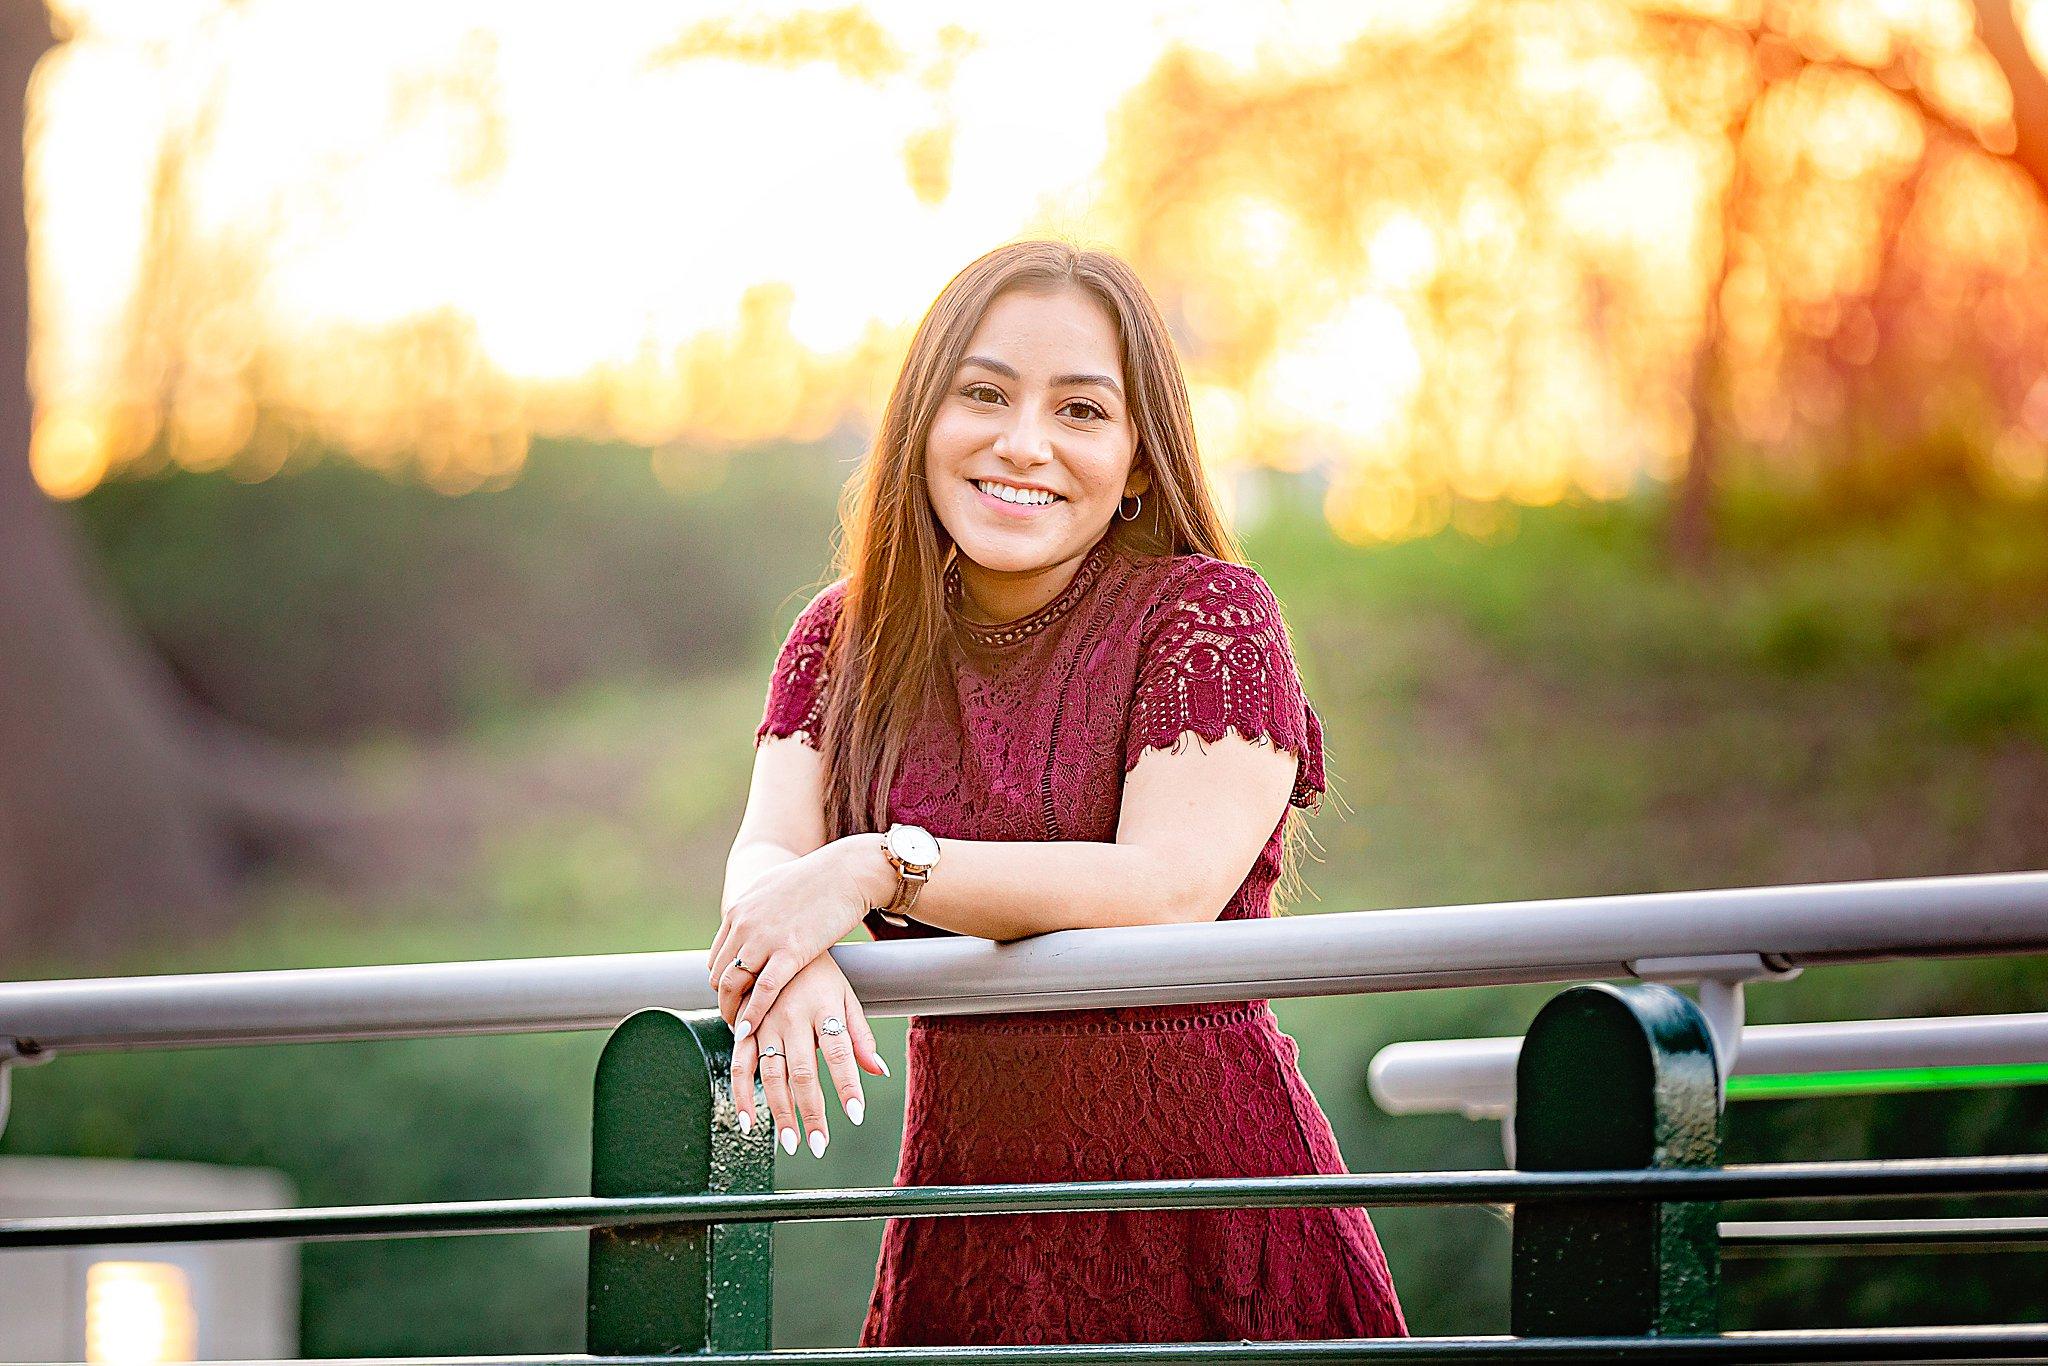 Carly-Barton-Photography-Texas-Photographer-High-School-Senior-Photos-The-Historic-Pearl-San-Antonio_0026.jpg